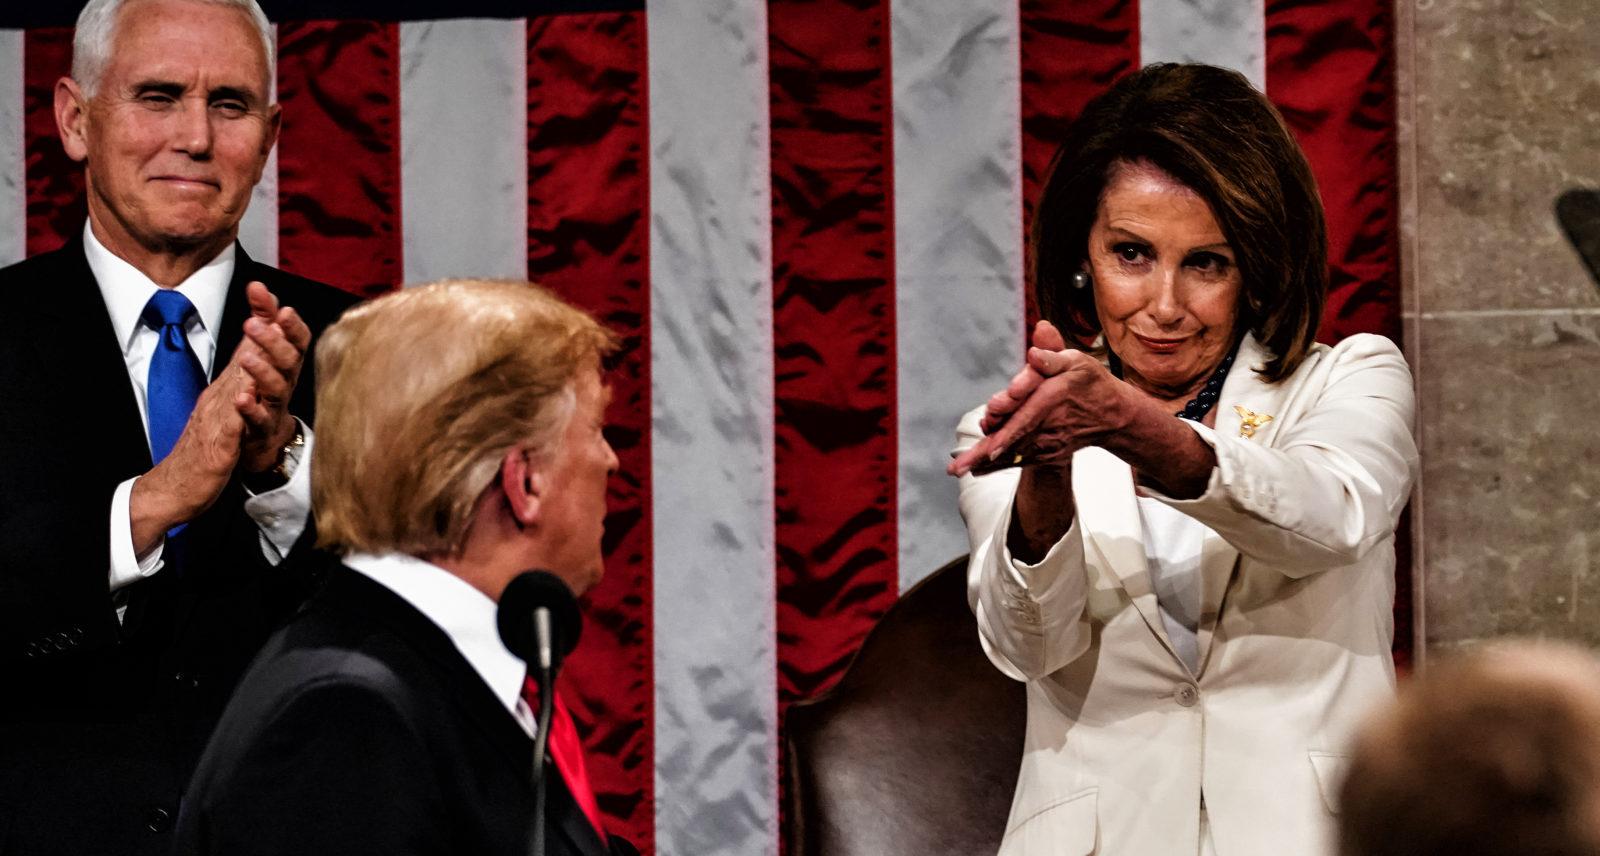 Ready to start 2nd impeachment proceedings against Trump: Pelosi